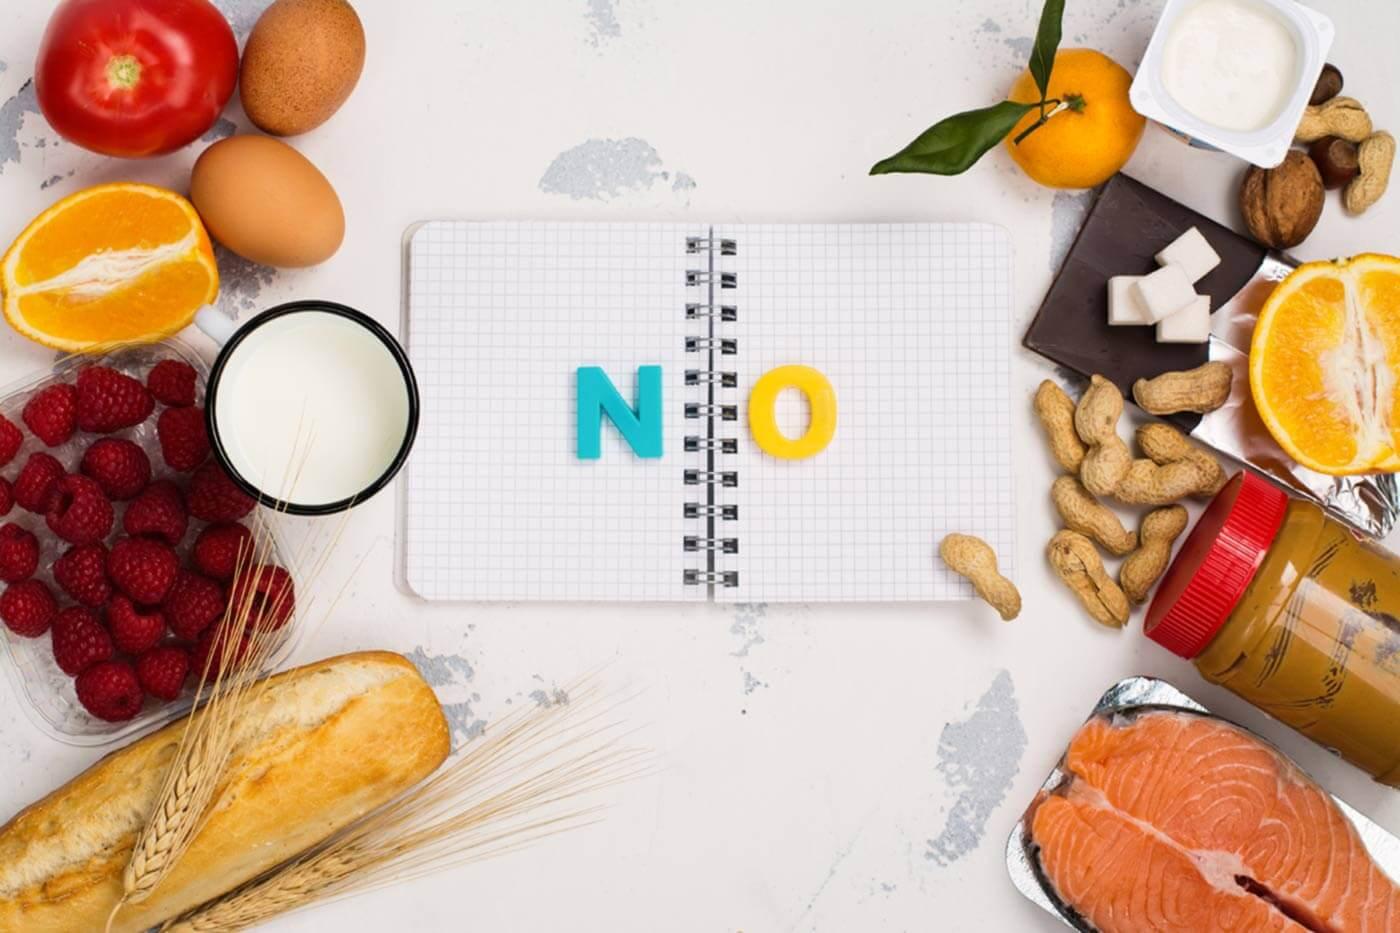 food allergy vs intolerance